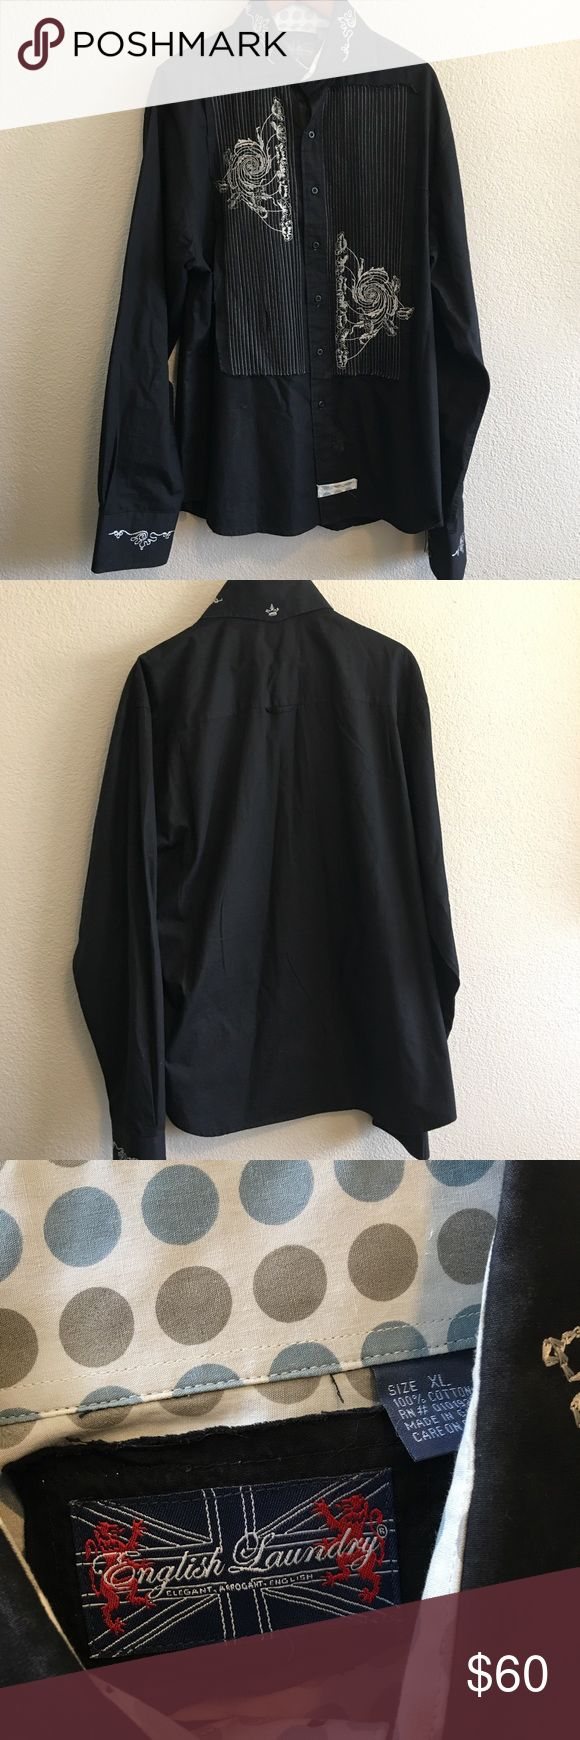 Men's English Laundry Dress Shirt Collared English Laundry long sleeve dress shirt with embroidered detail button down in size XL English Laundry Shirts Dress Shirts